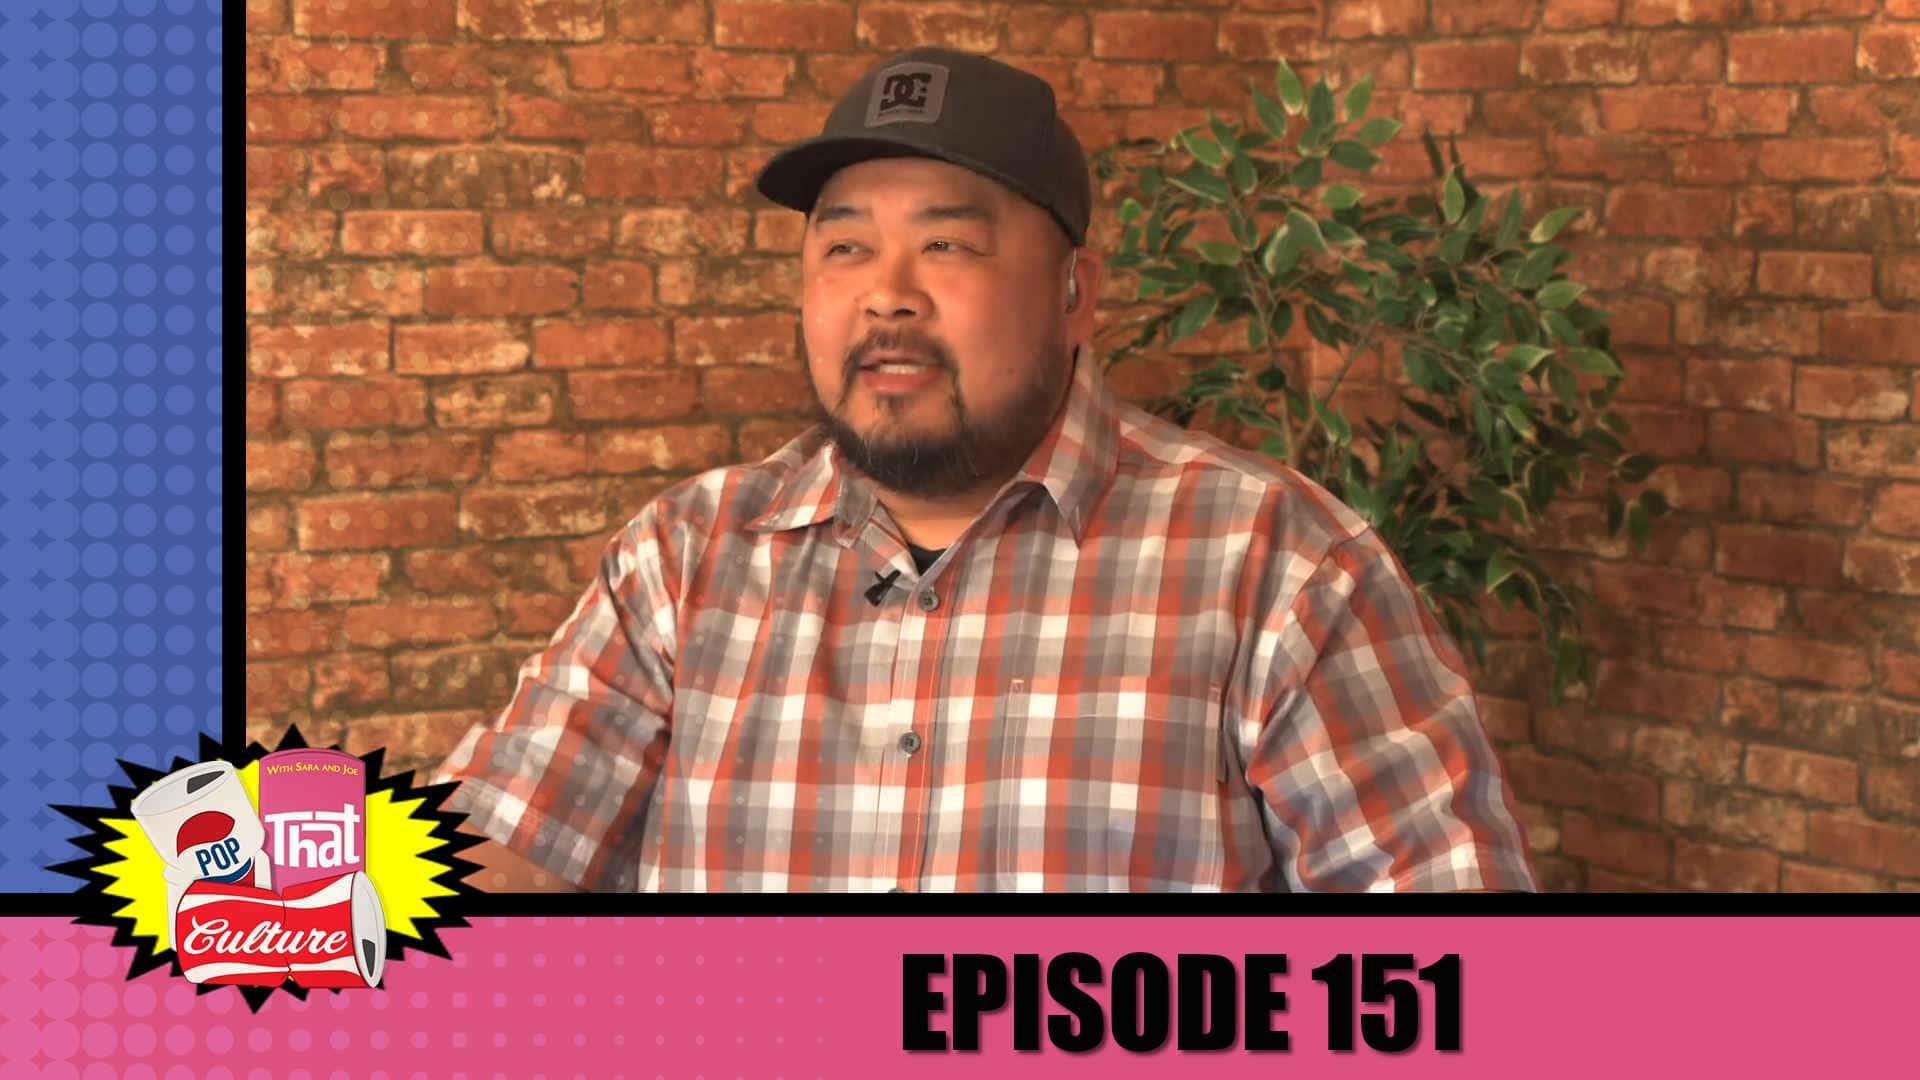 Pop That Culture - Episode 151